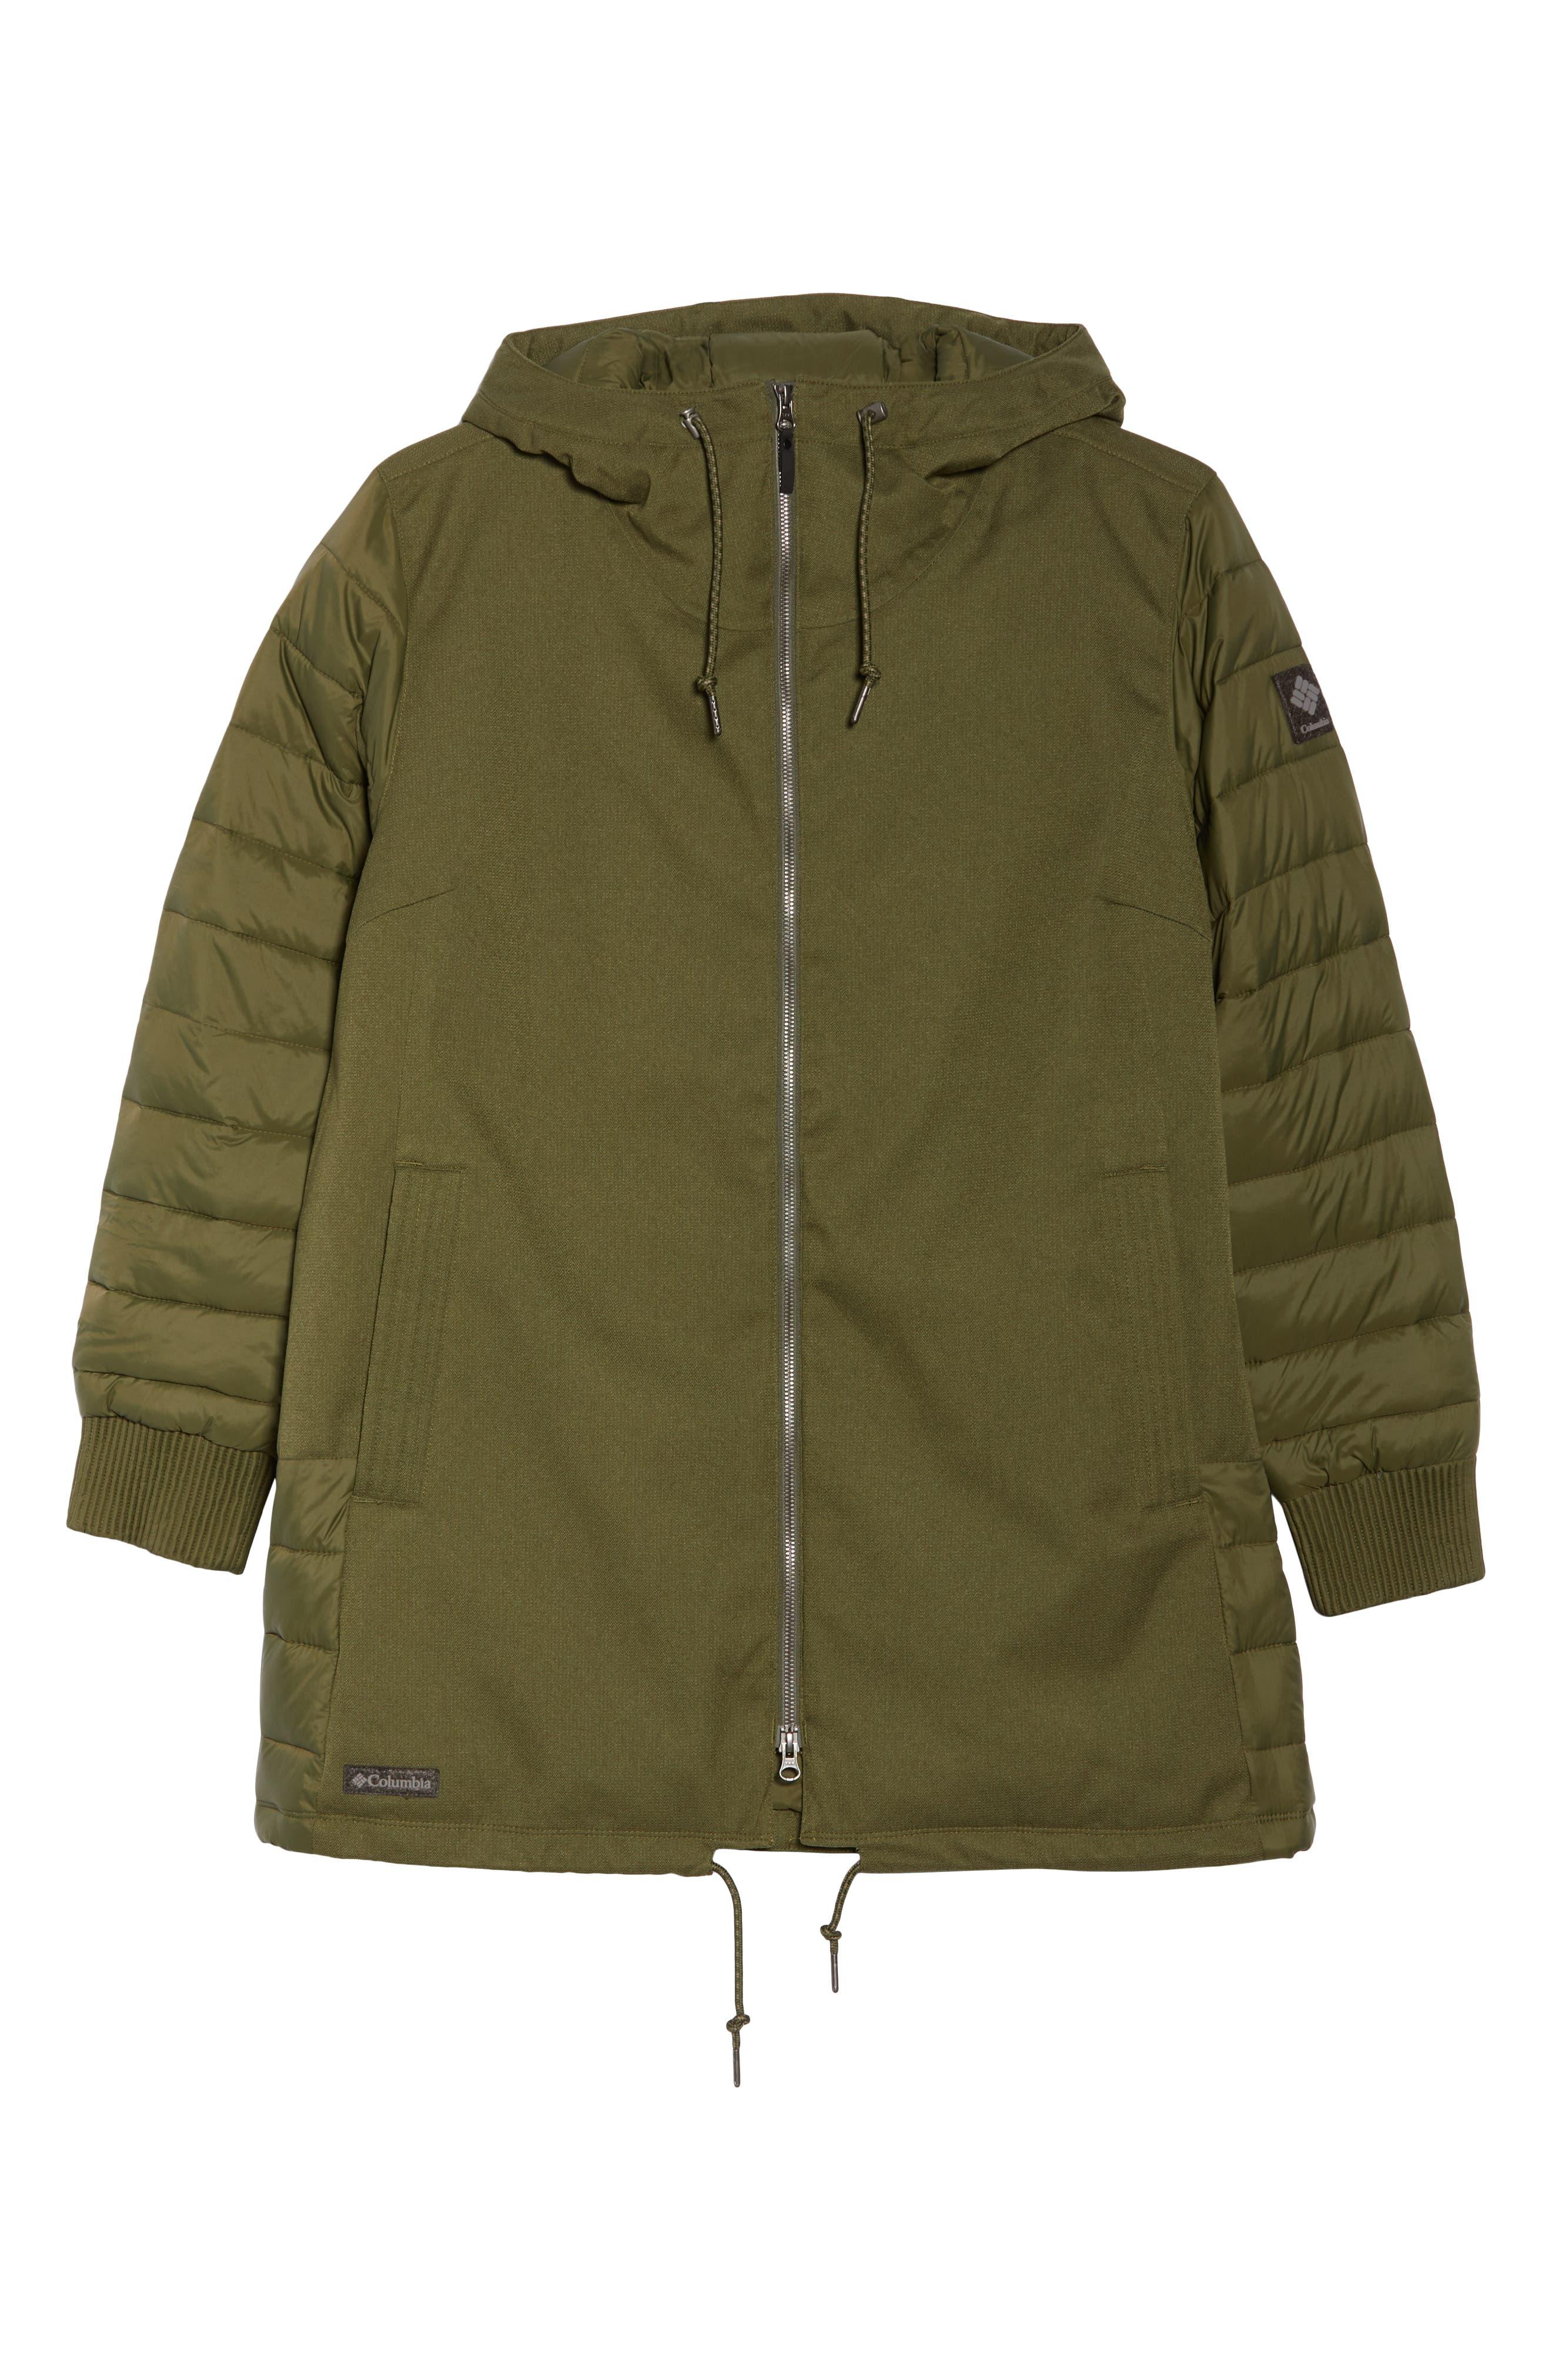 Boundary Bay Waterproof Hybrid Jacket,                             Alternate thumbnail 6, color,                             383